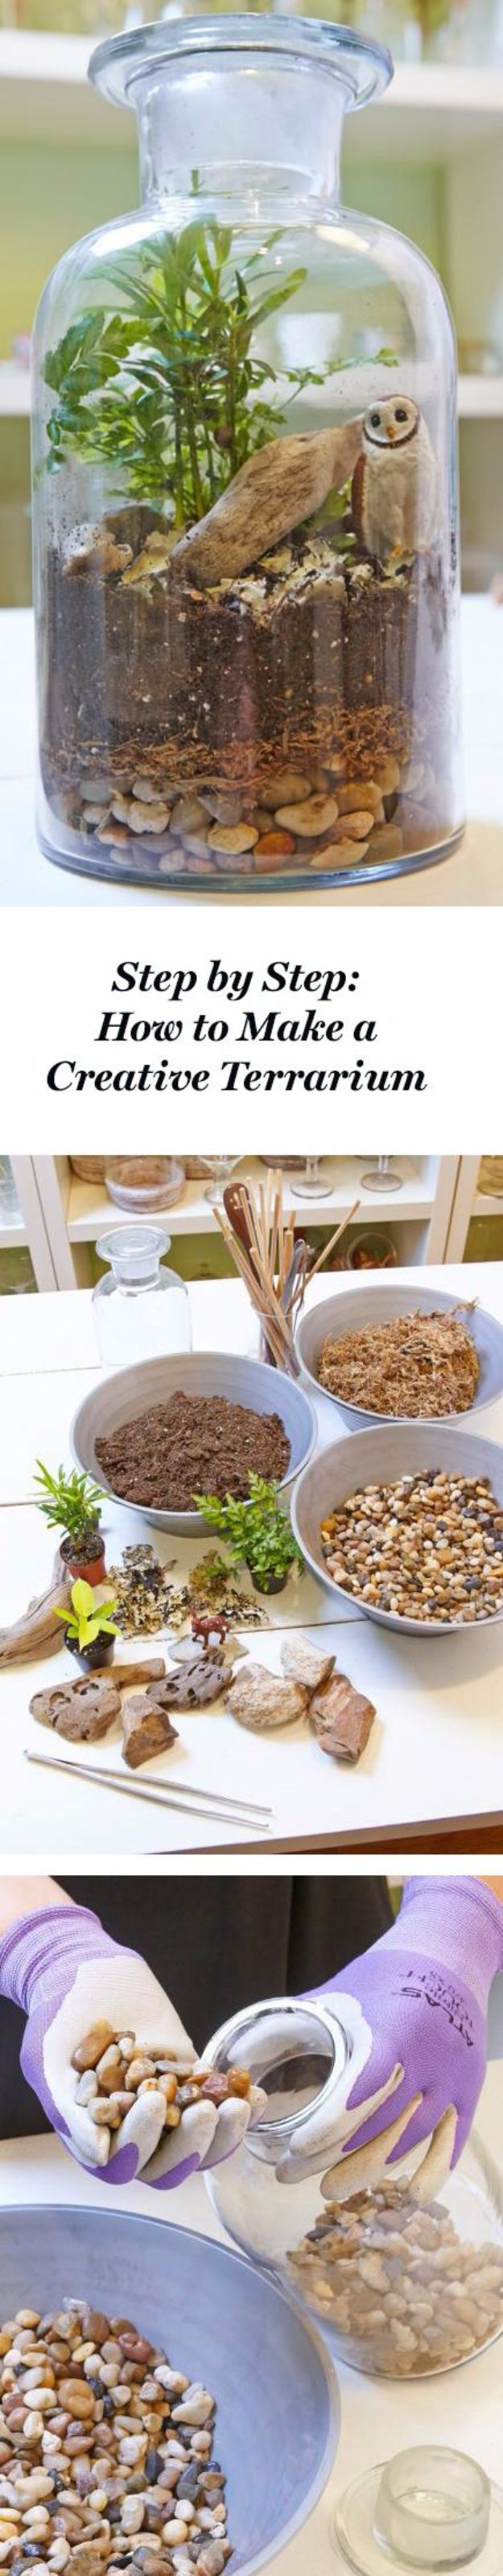 DIY Terrarium Ideas - Creative Terrarium - Cool Terrariums and Crafts With Mason Jars, Succulents, Wood, Geometric Designs and Reptile, Acquarium - Easy DIY Terrariums for Adults and Kids To Make at Home http://diyjoy.com/diy-terrarium-ideas